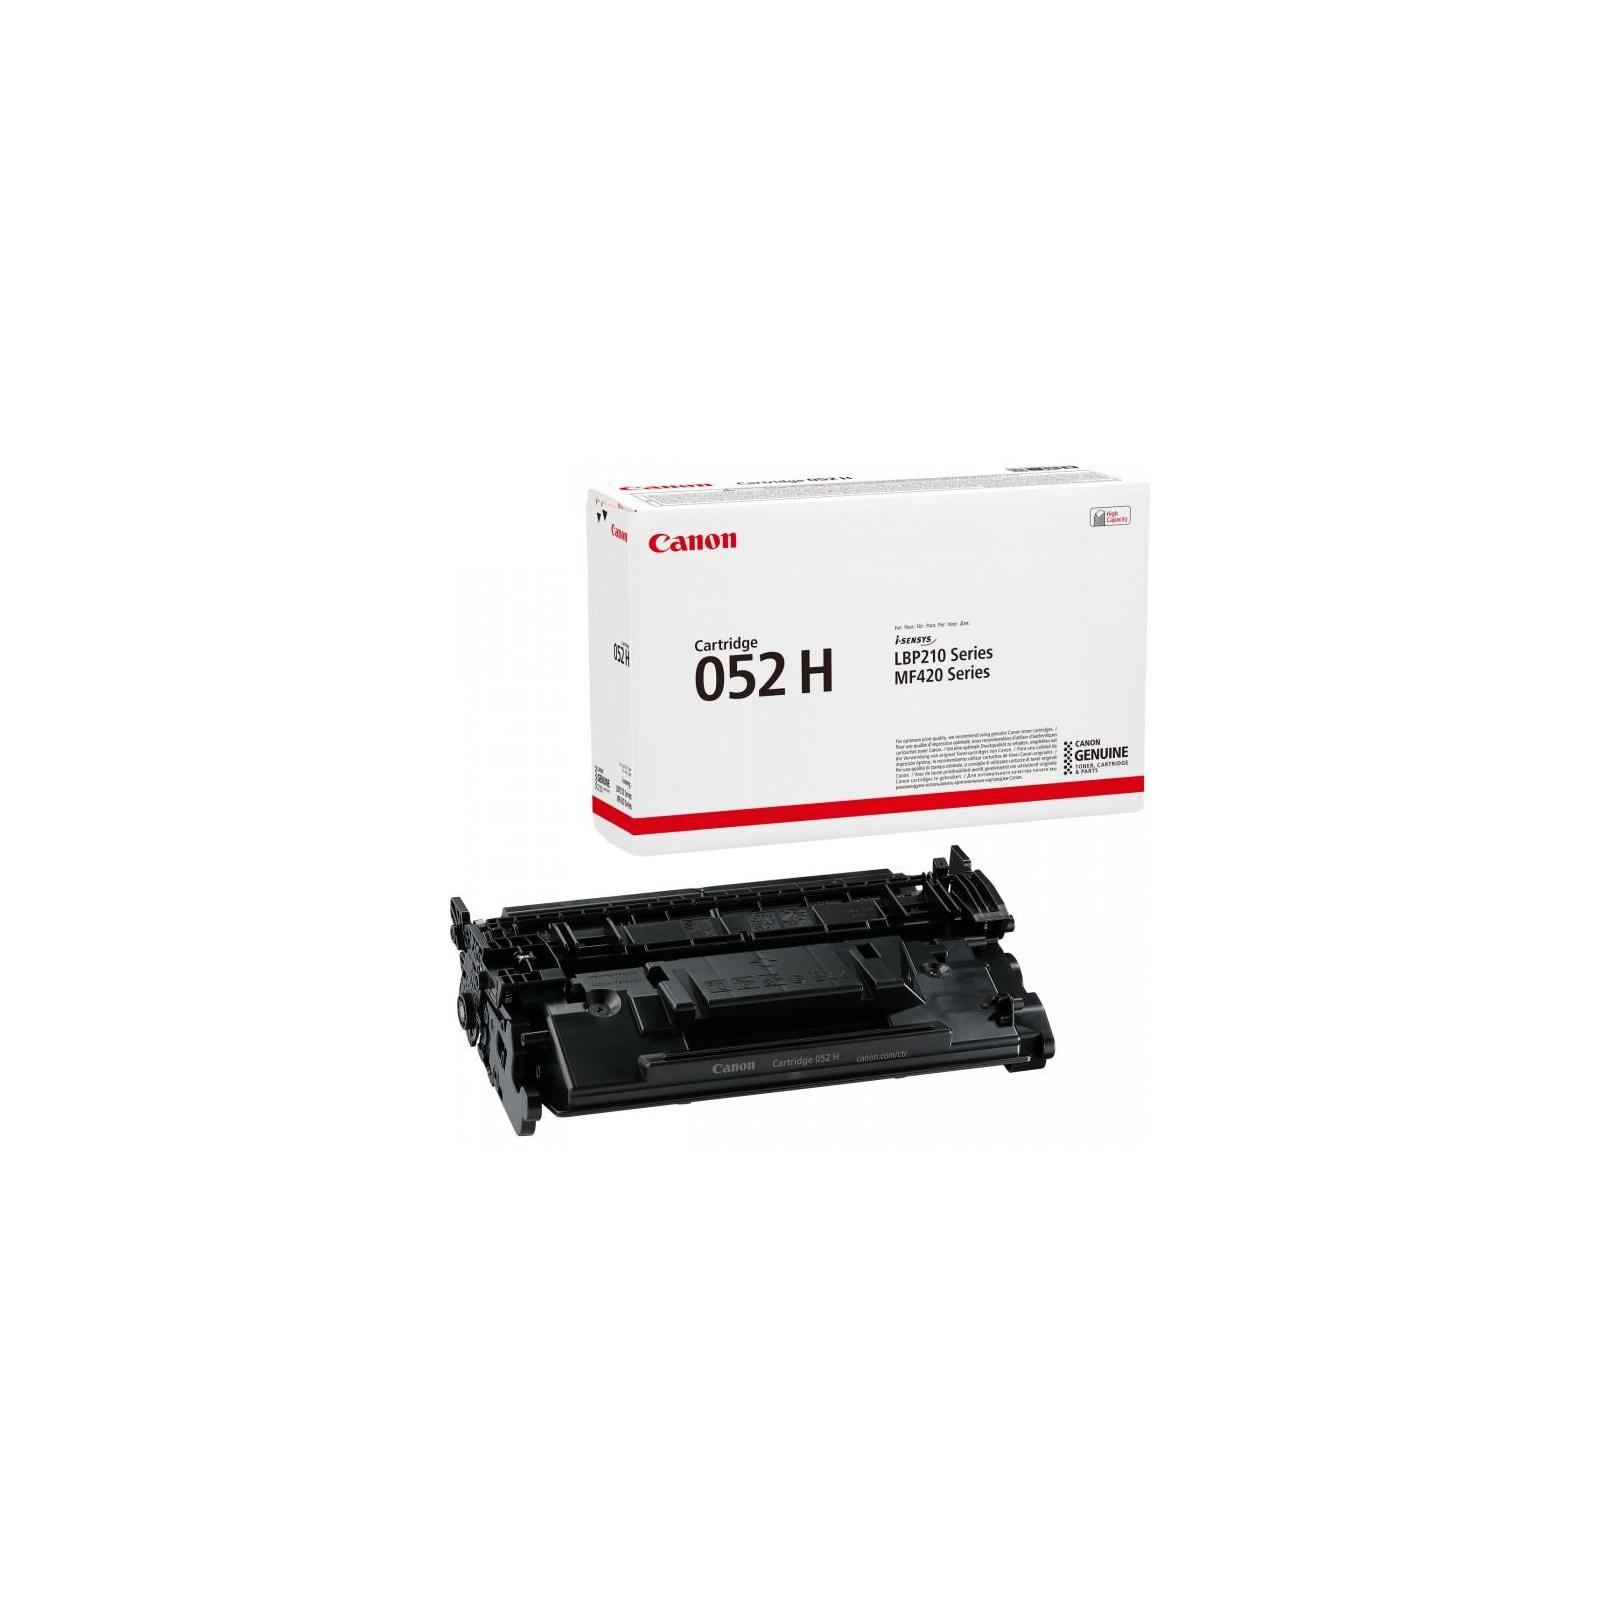 Картридж Canon 052H Black 9K (2200C002)